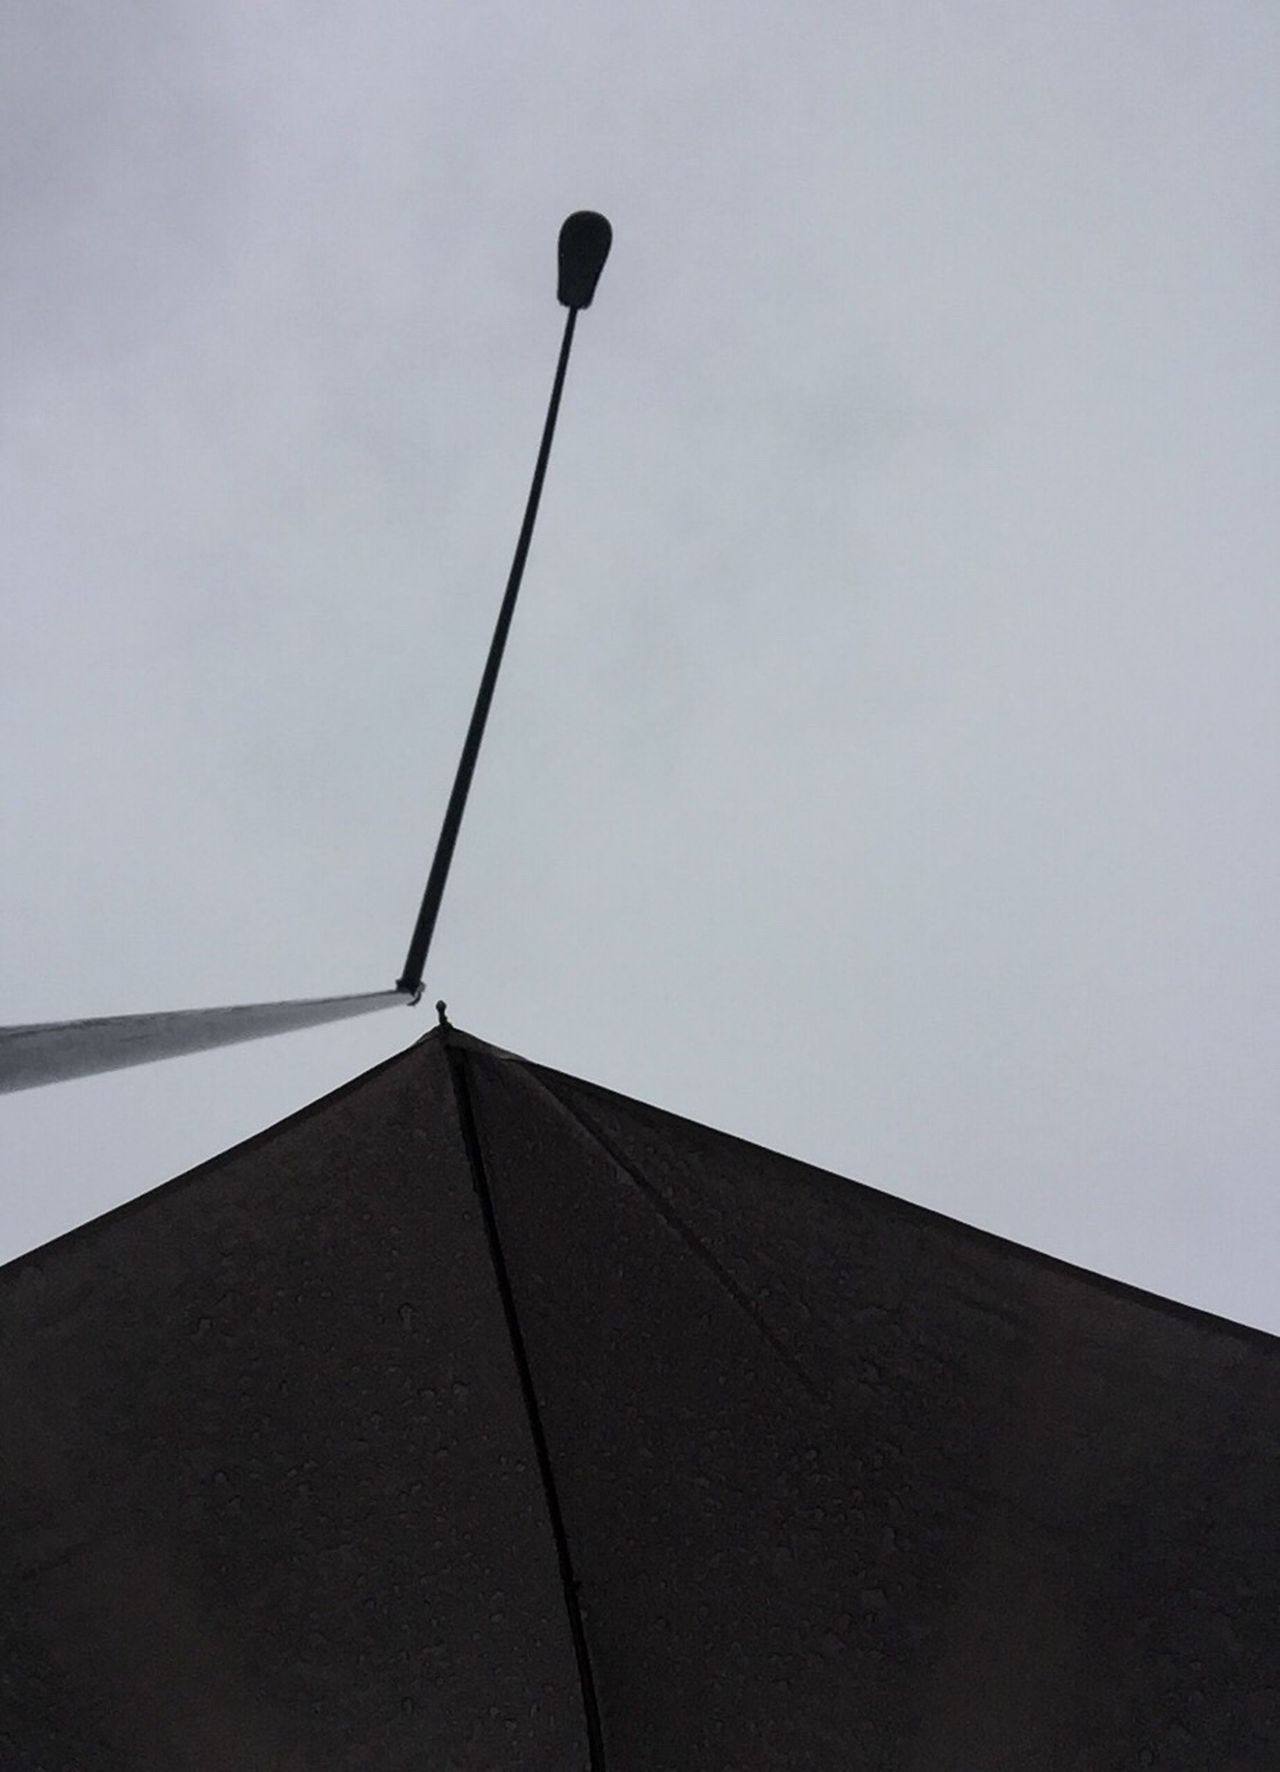 Low Angle View Sky Rain Umbrella Grey Streetlight